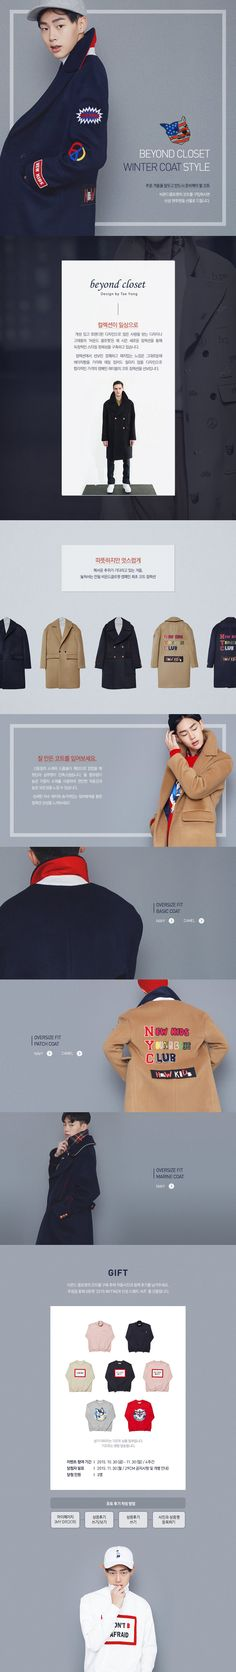 [ONLY 29CM] beyond closet, 겨울 코트 시리즈 공개 & 포토 후기